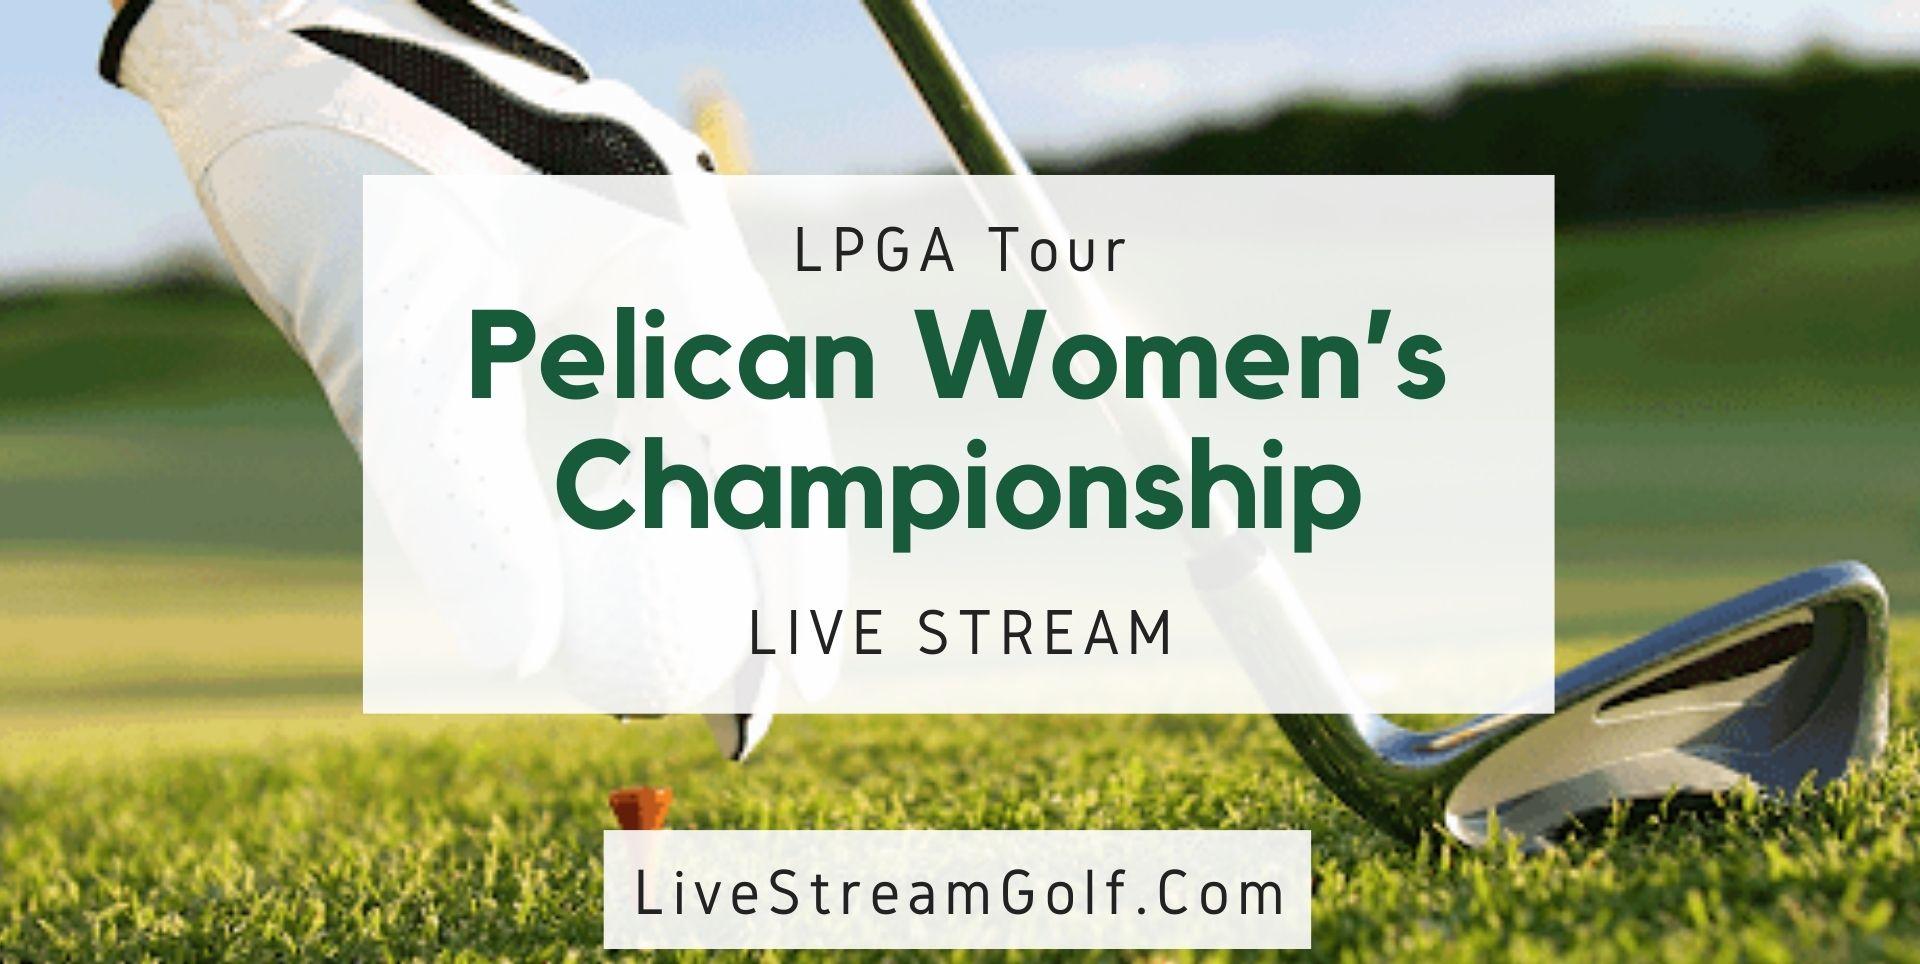 Pelican Women's Championship Rd 3 Live Stream: LPGA 2021